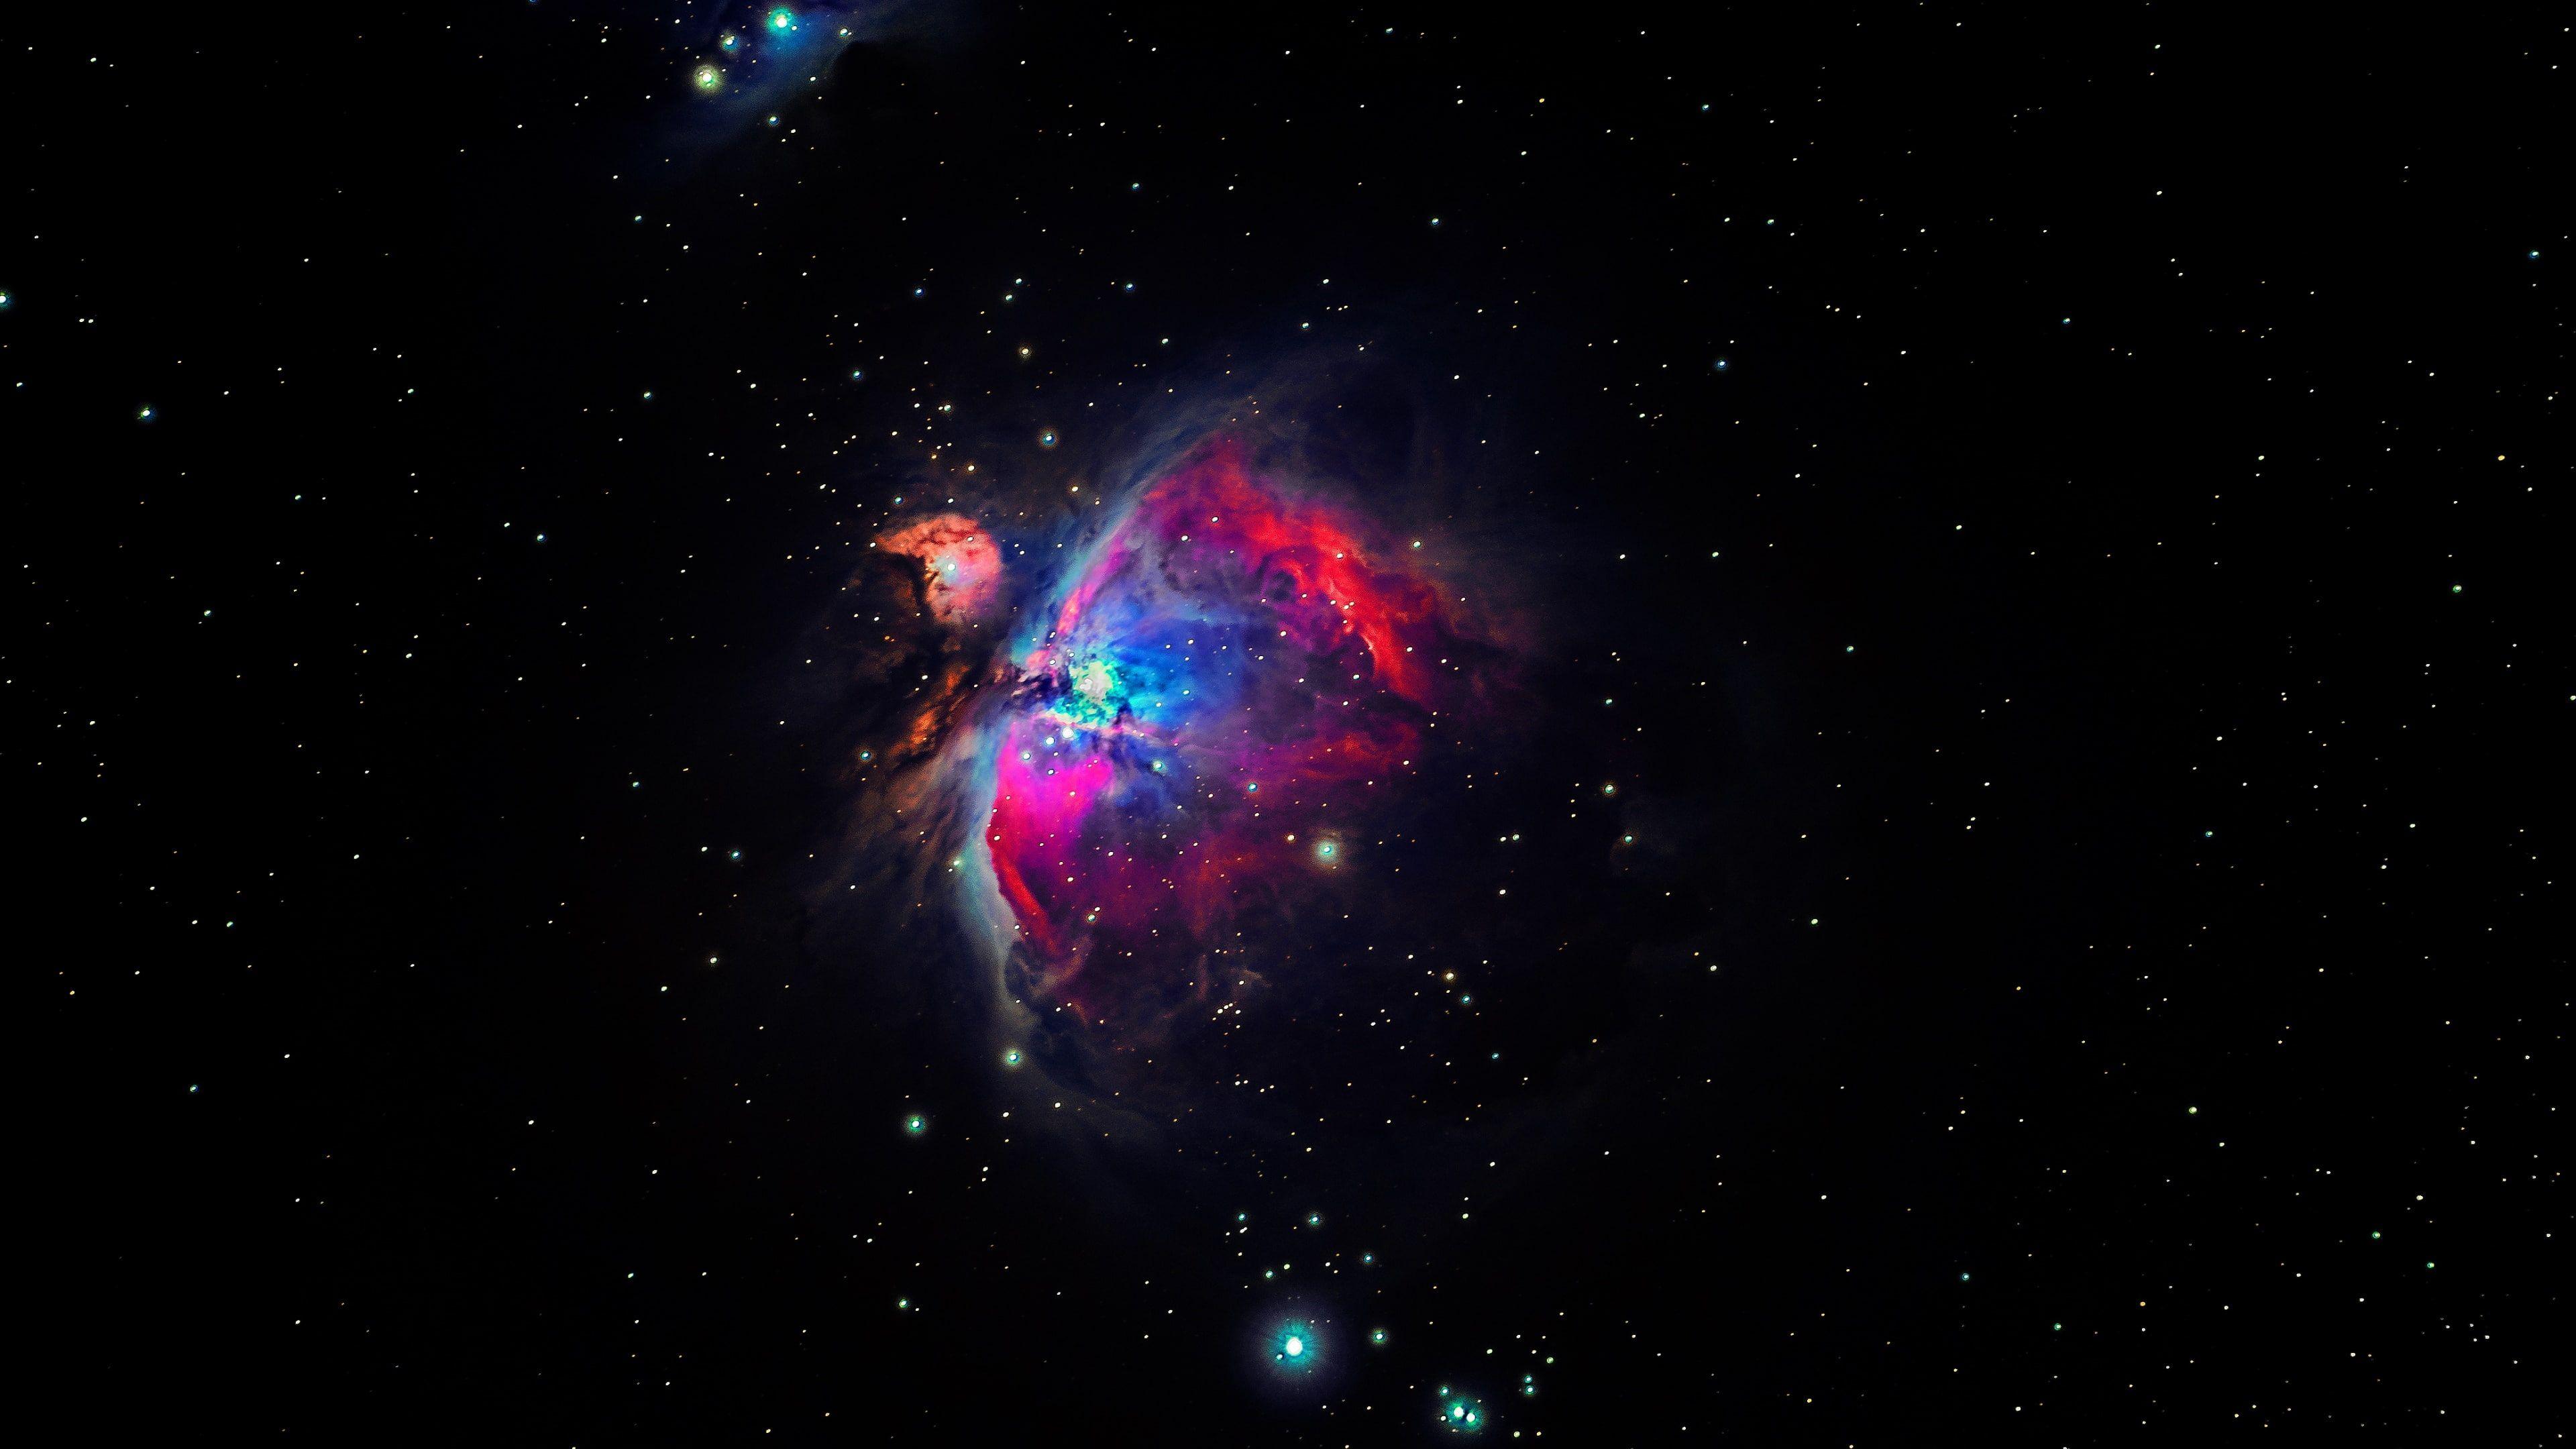 nebula galaxy universe space astronomy m42 orion